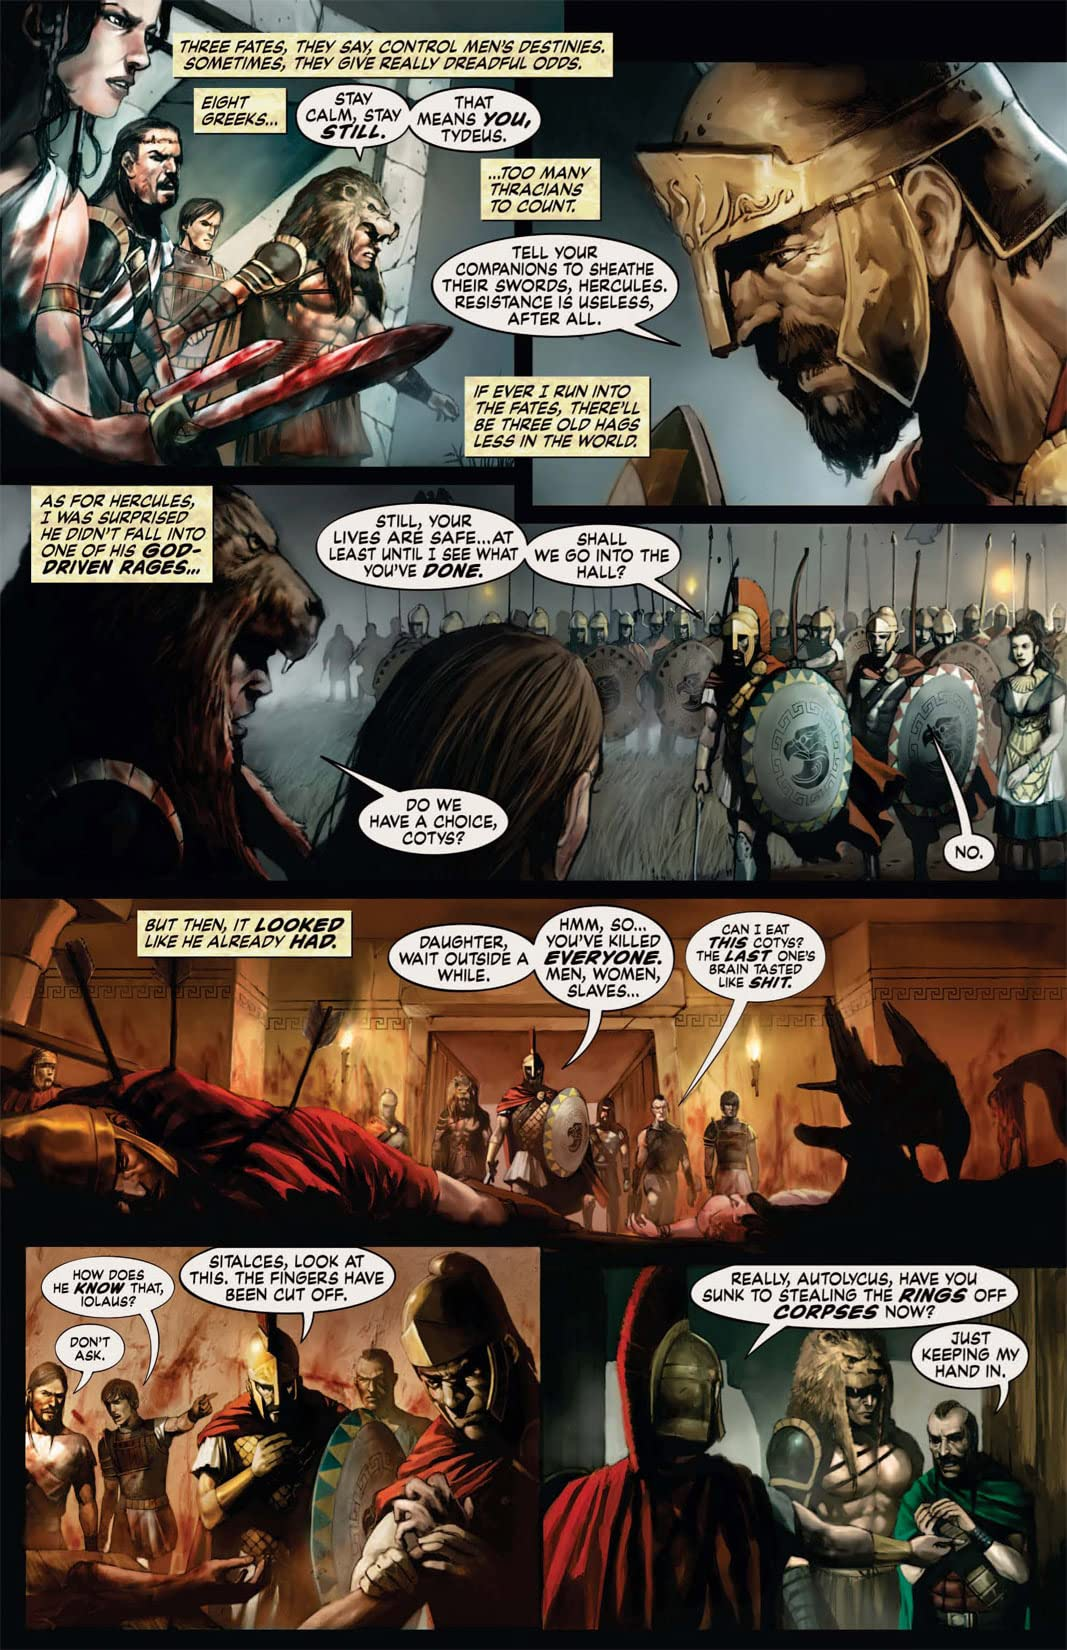 Hercules: The Thracian Wars #2 (of 5)